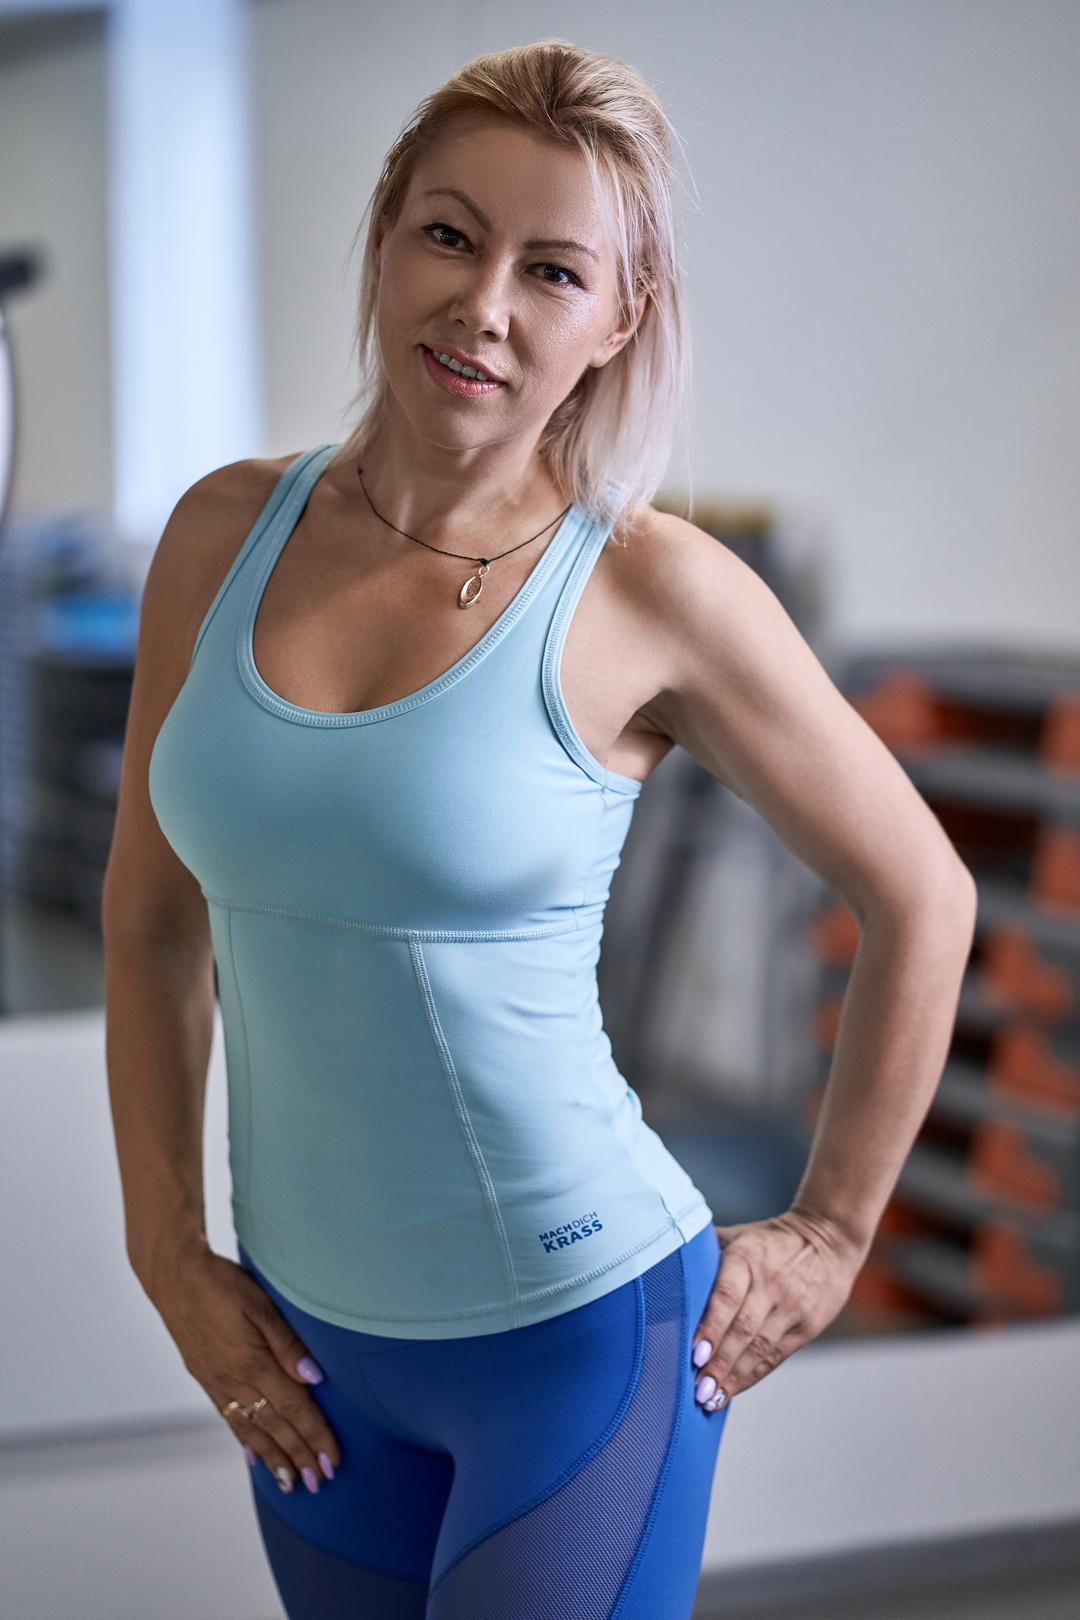 Ткаченко Ольга – тренер по Kangoo Jumps